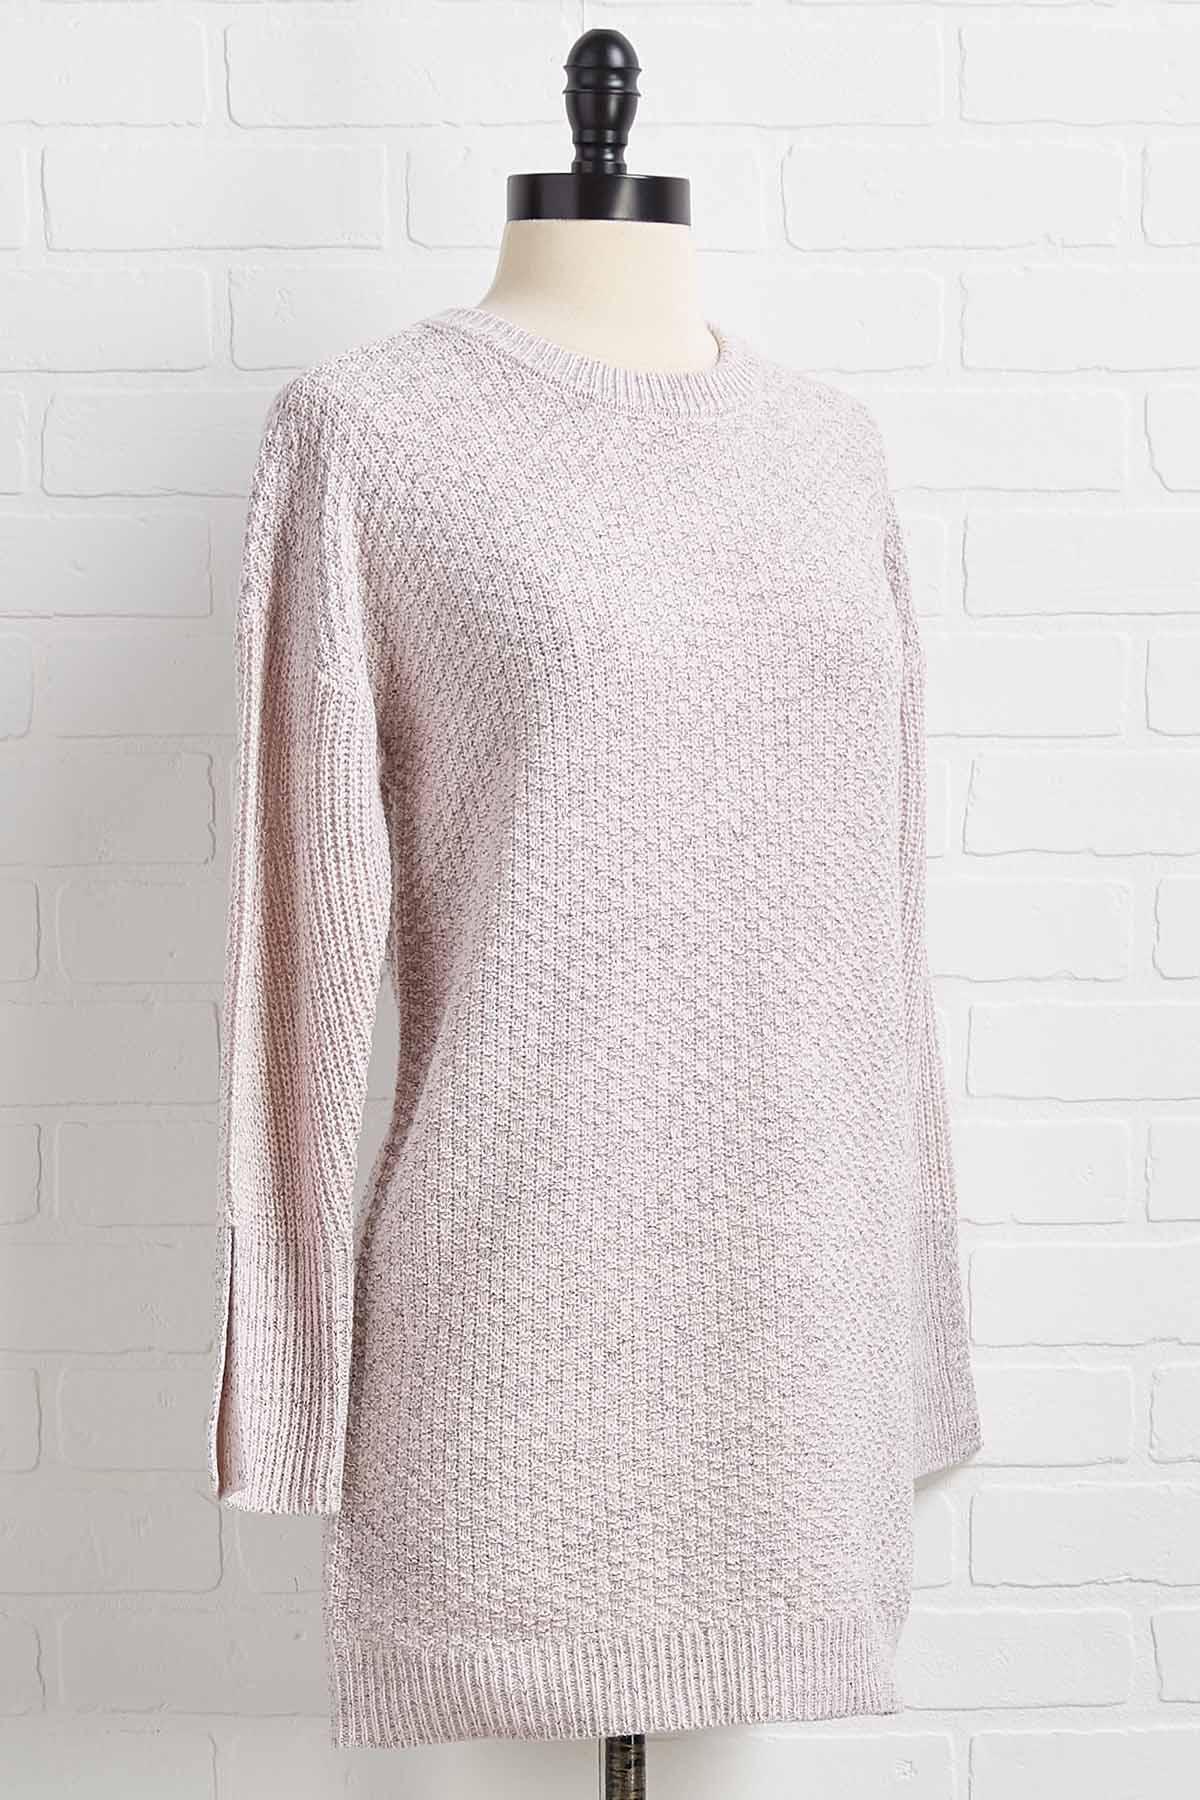 New Love Sweater